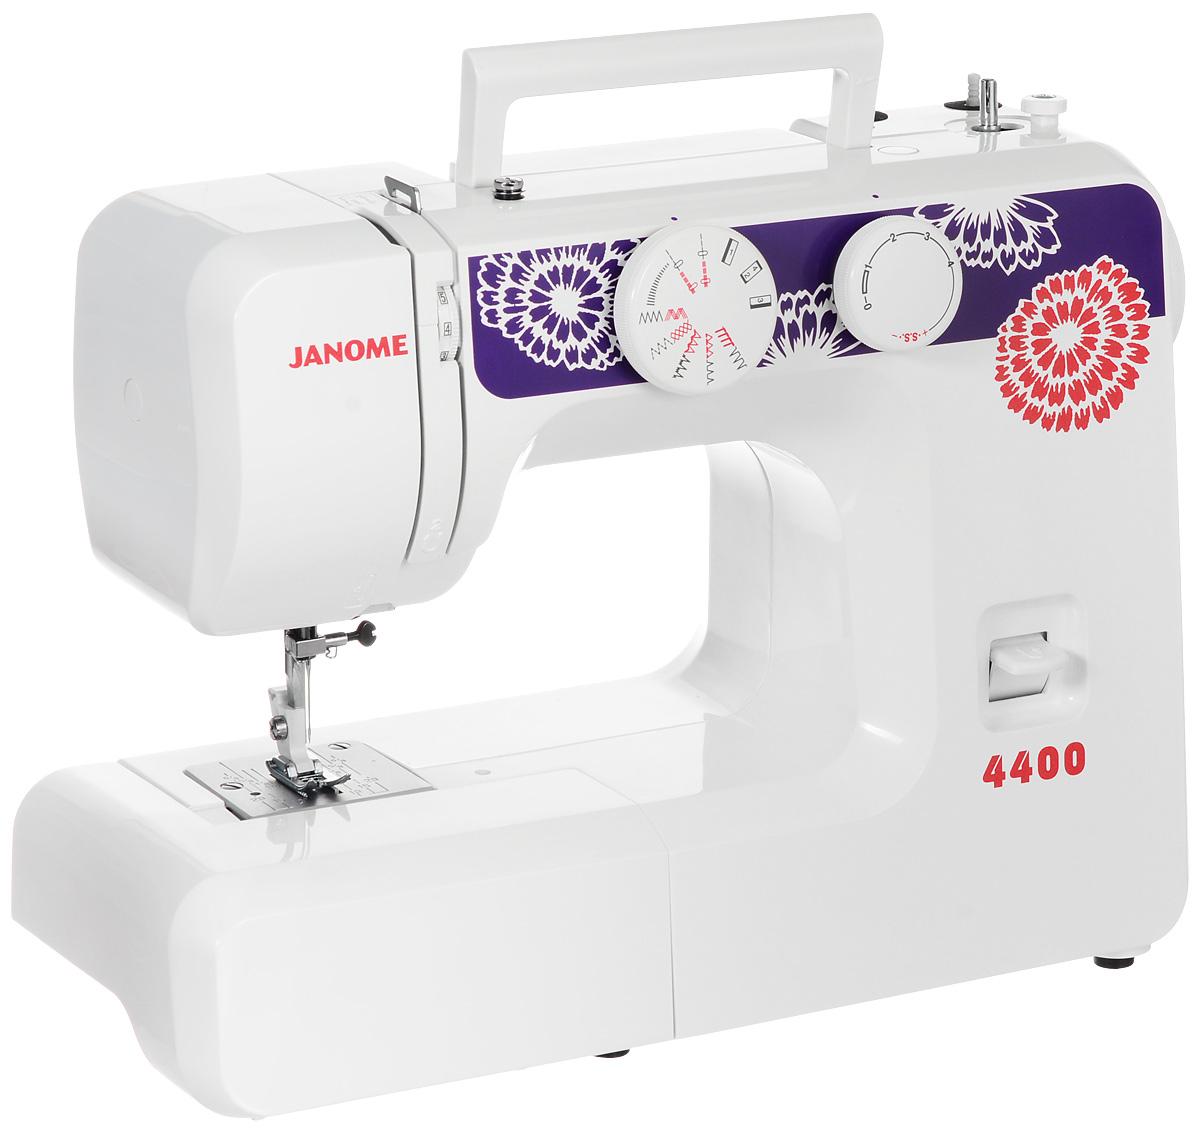 Janome 4400 швейная машина